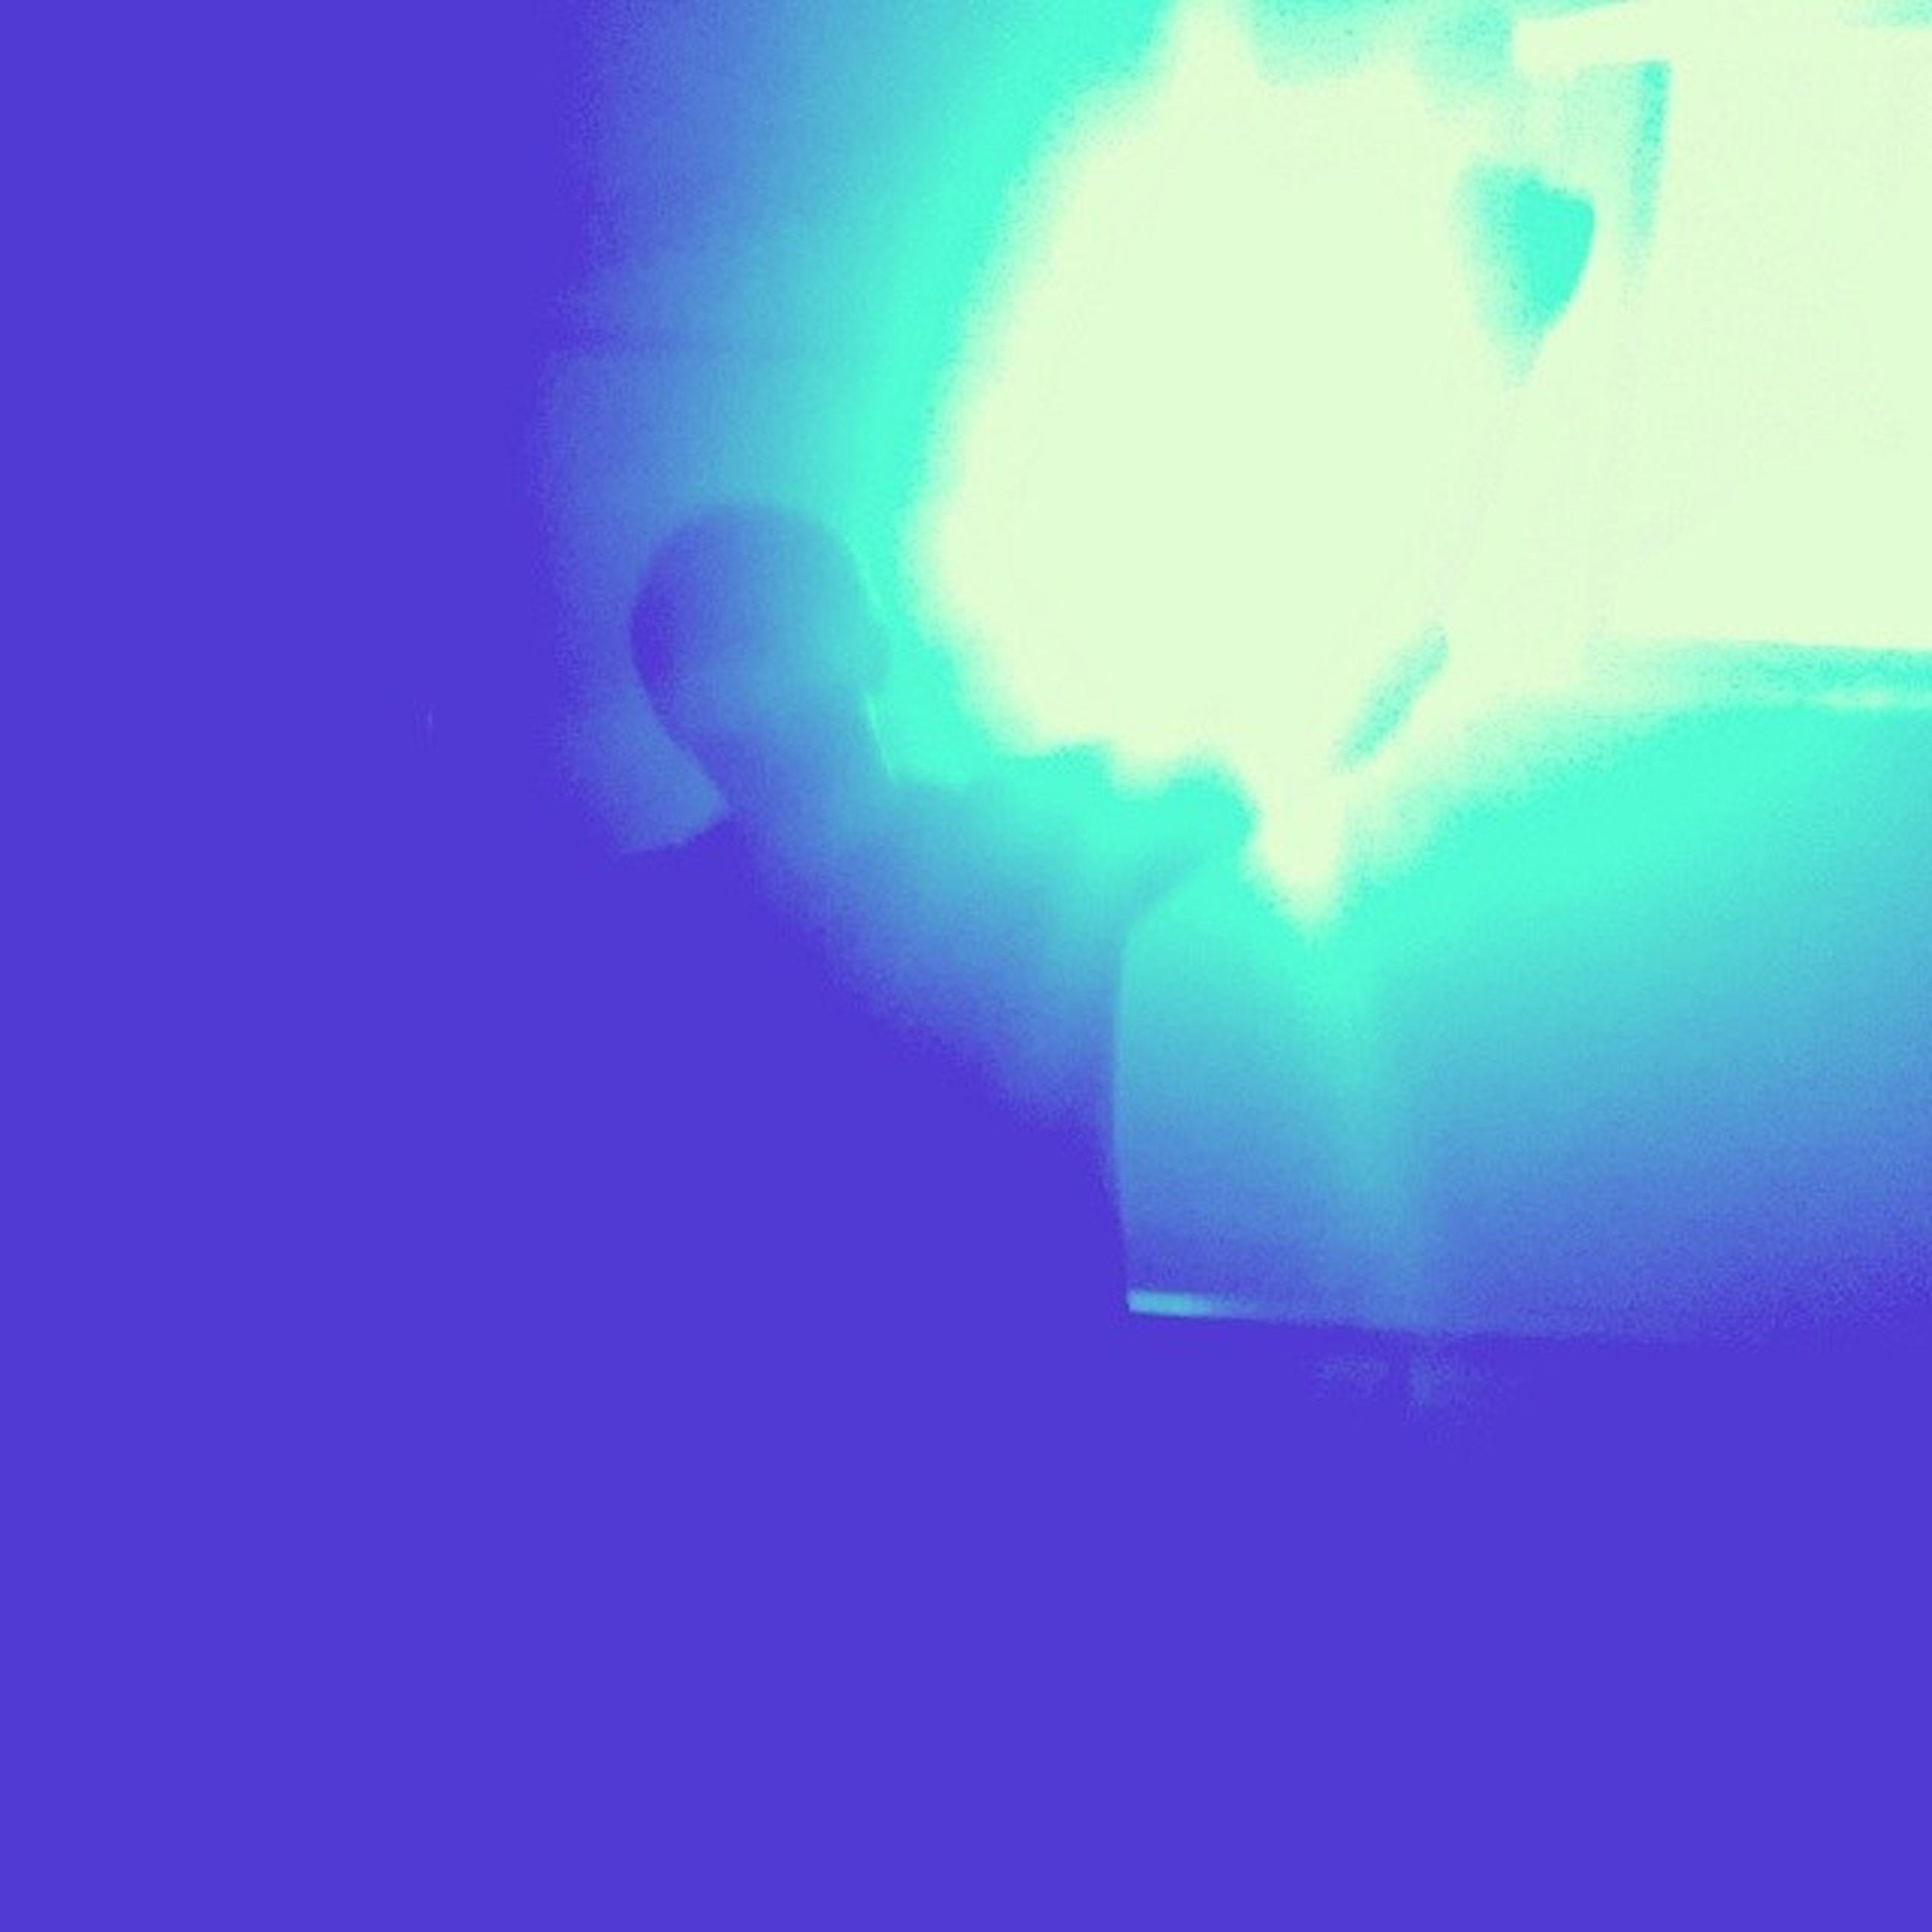 lifestyles, leisure activity, indoors, men, blue, person, illuminated, unrecognizable person, light - natural phenomenon, enjoyment, music, arts culture and entertainment, night, nightclub, nightlife, underwater